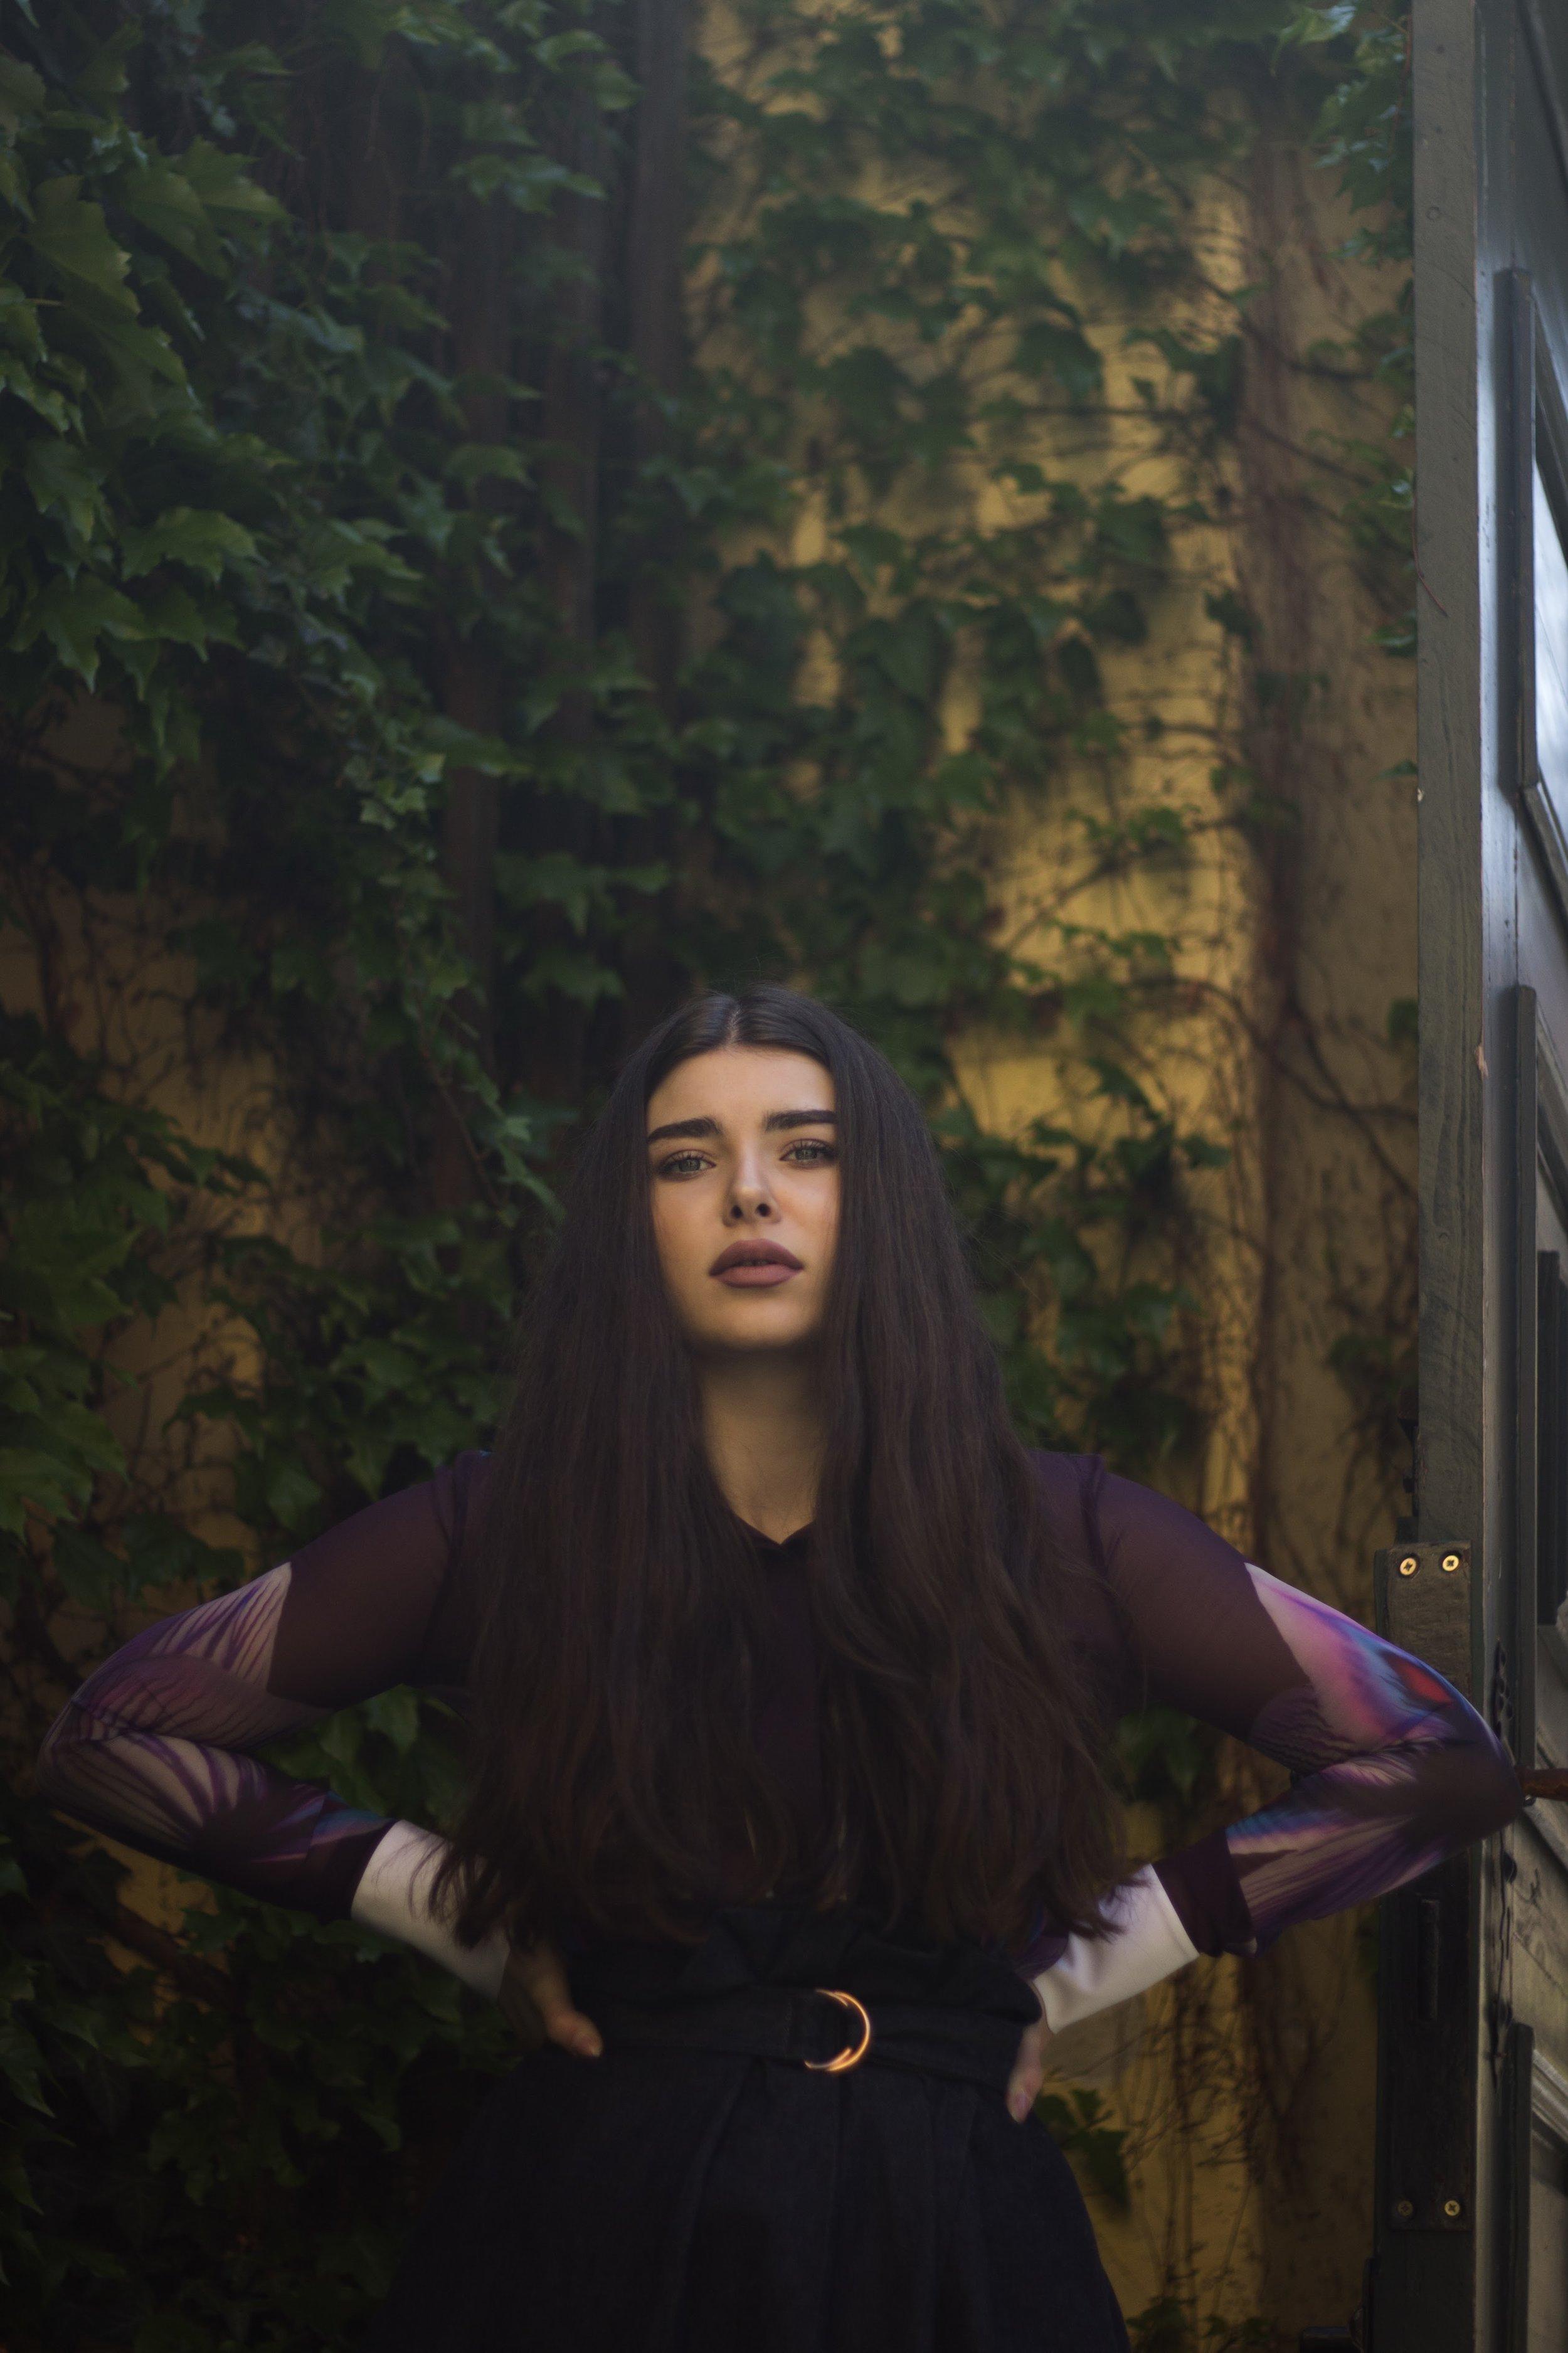 luka-lajic-ines-atelier-fashion-photography-zagreb-croatia (13).jpg